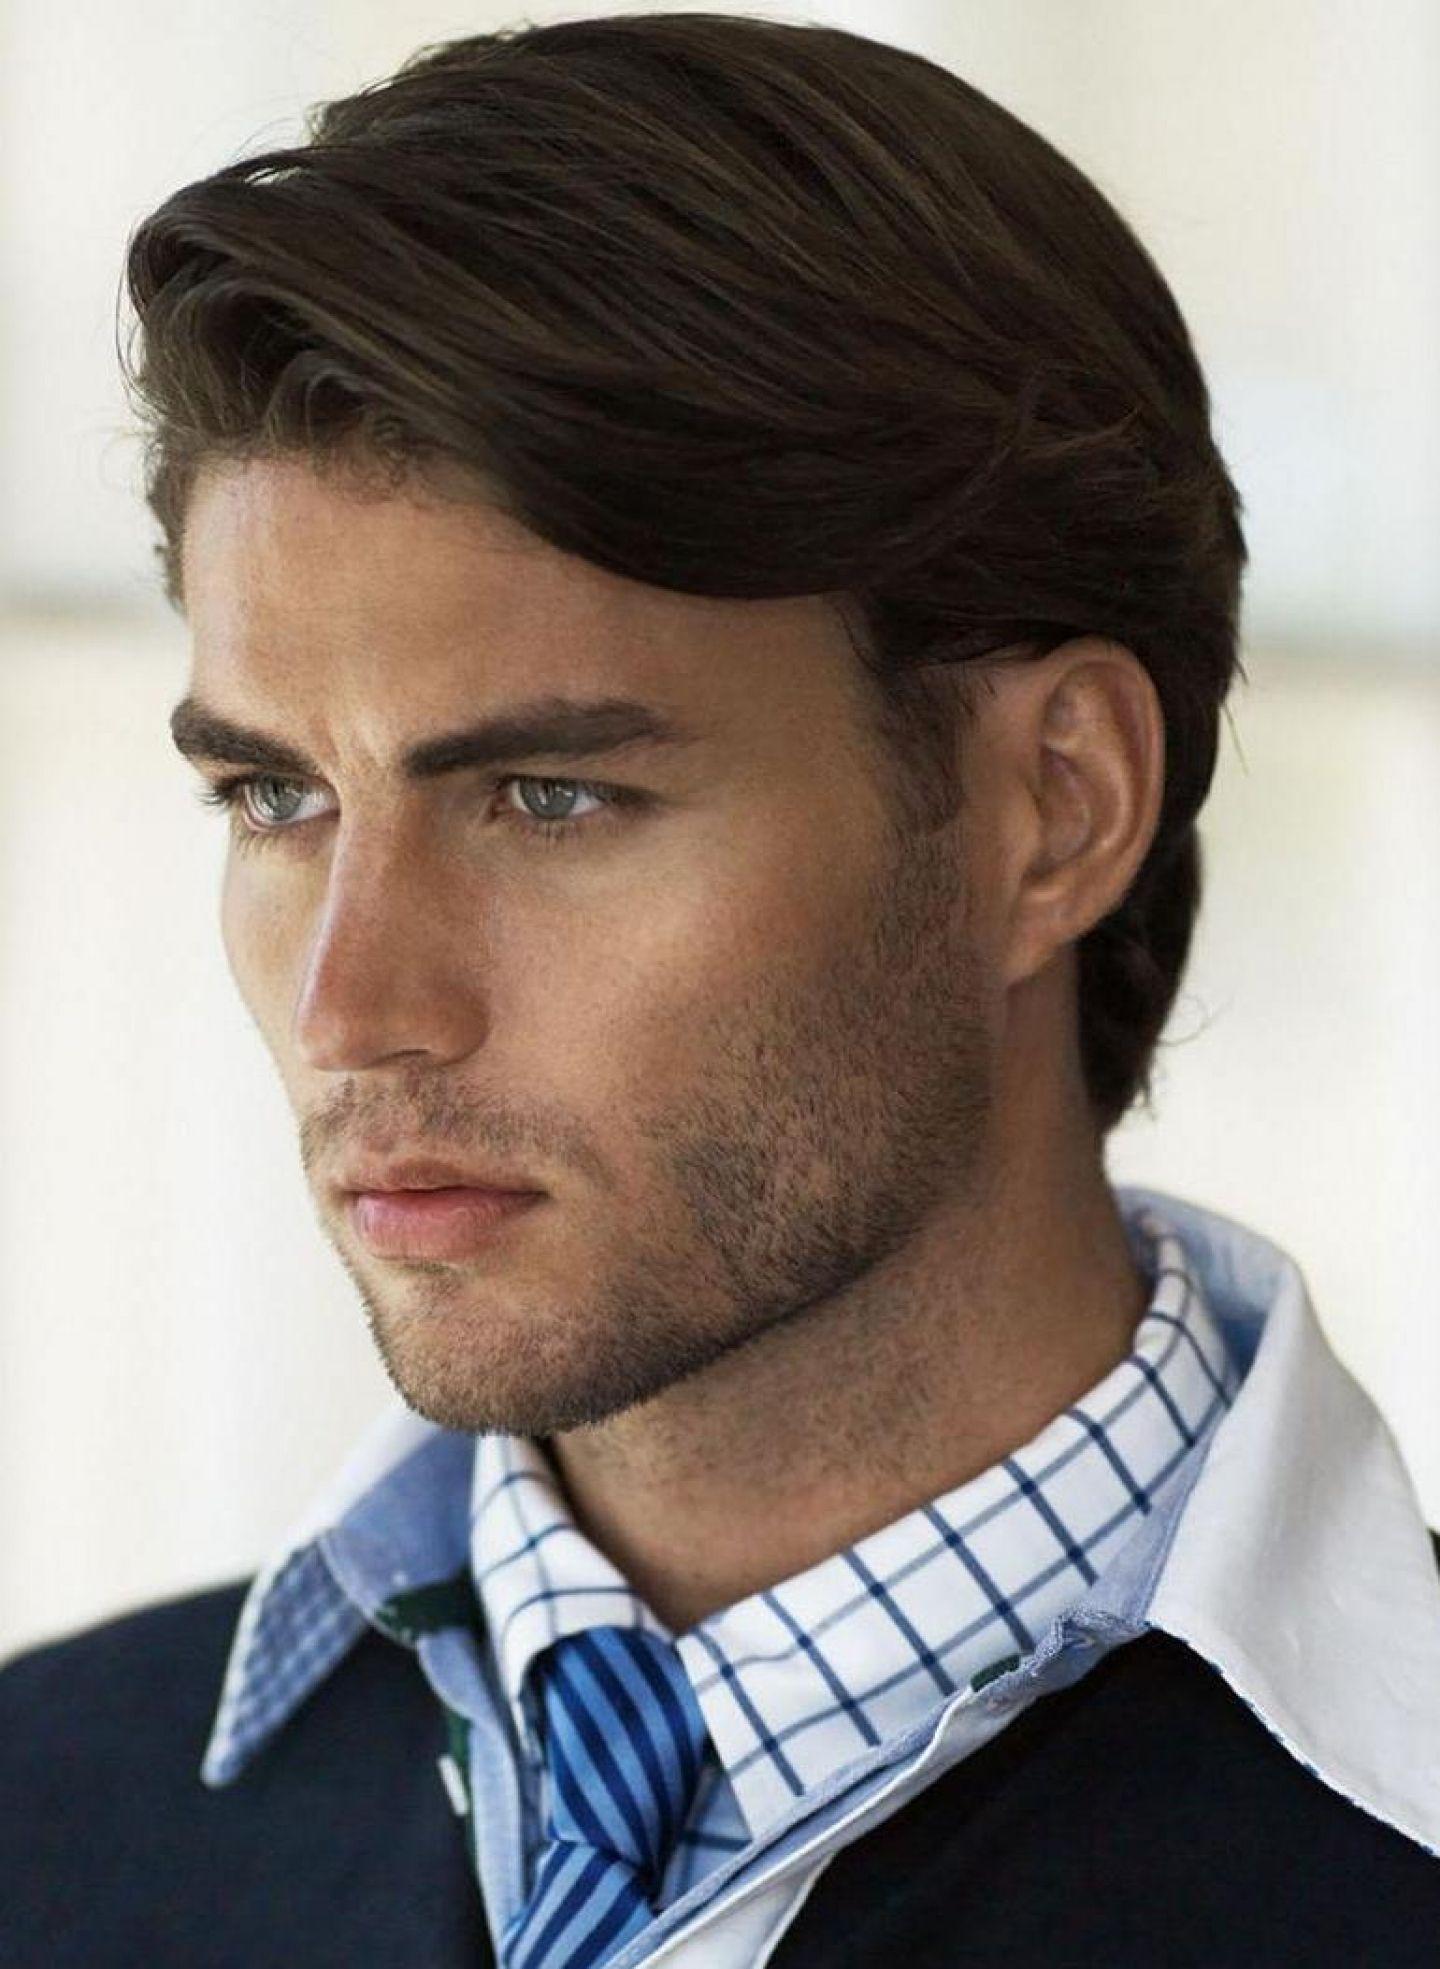 Pin By Lindsay Betz On Story Characters Long Hair Styles Men Medium Length Hair Styles Mens Hairstyles Medium